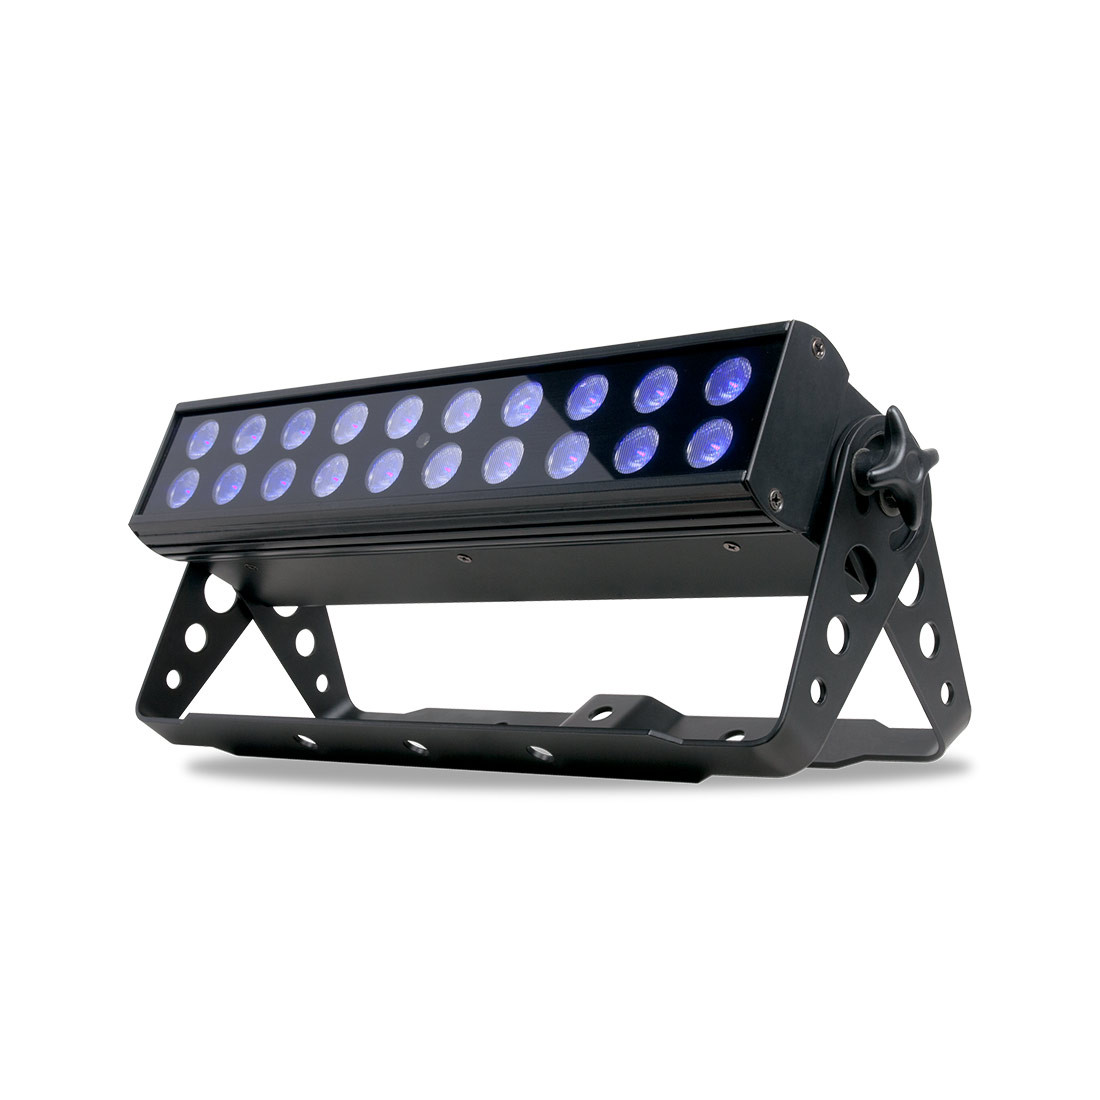 Uv led bar 20 product archive light lights products adj group uv led bar 20 aloadofball Images